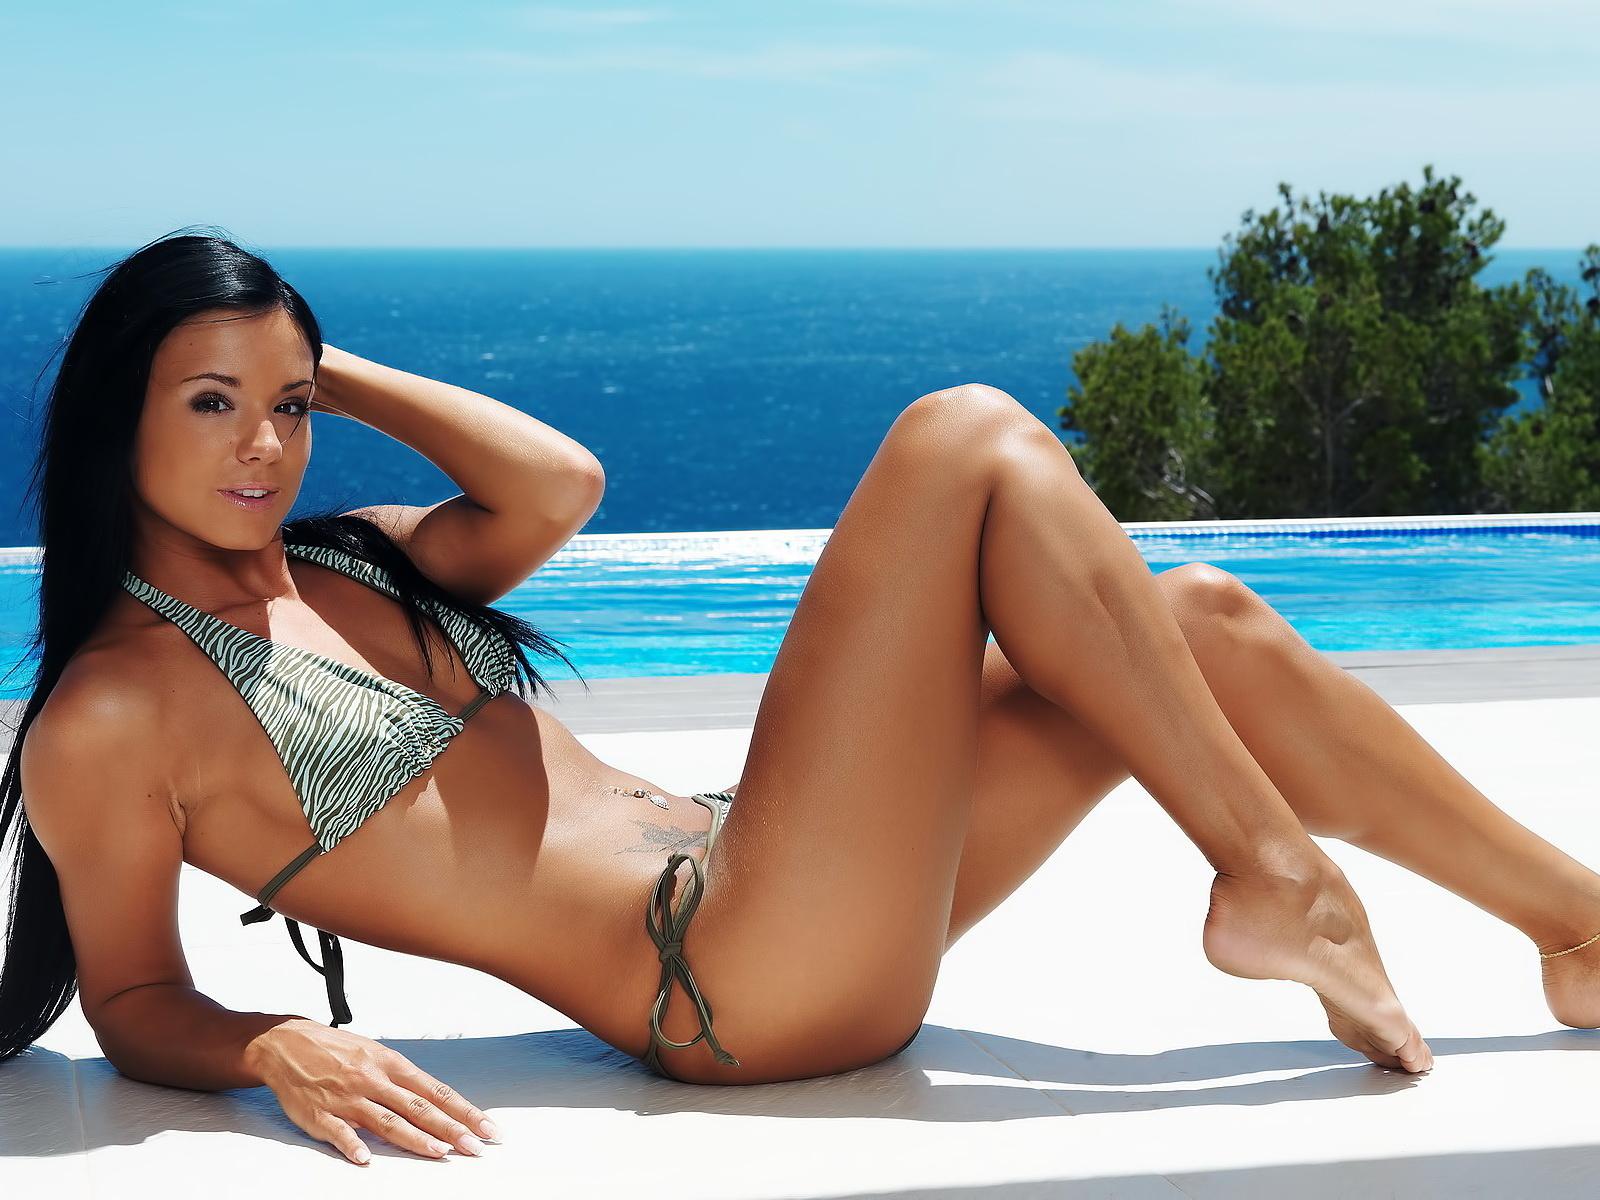 bikini hottie wallpaper